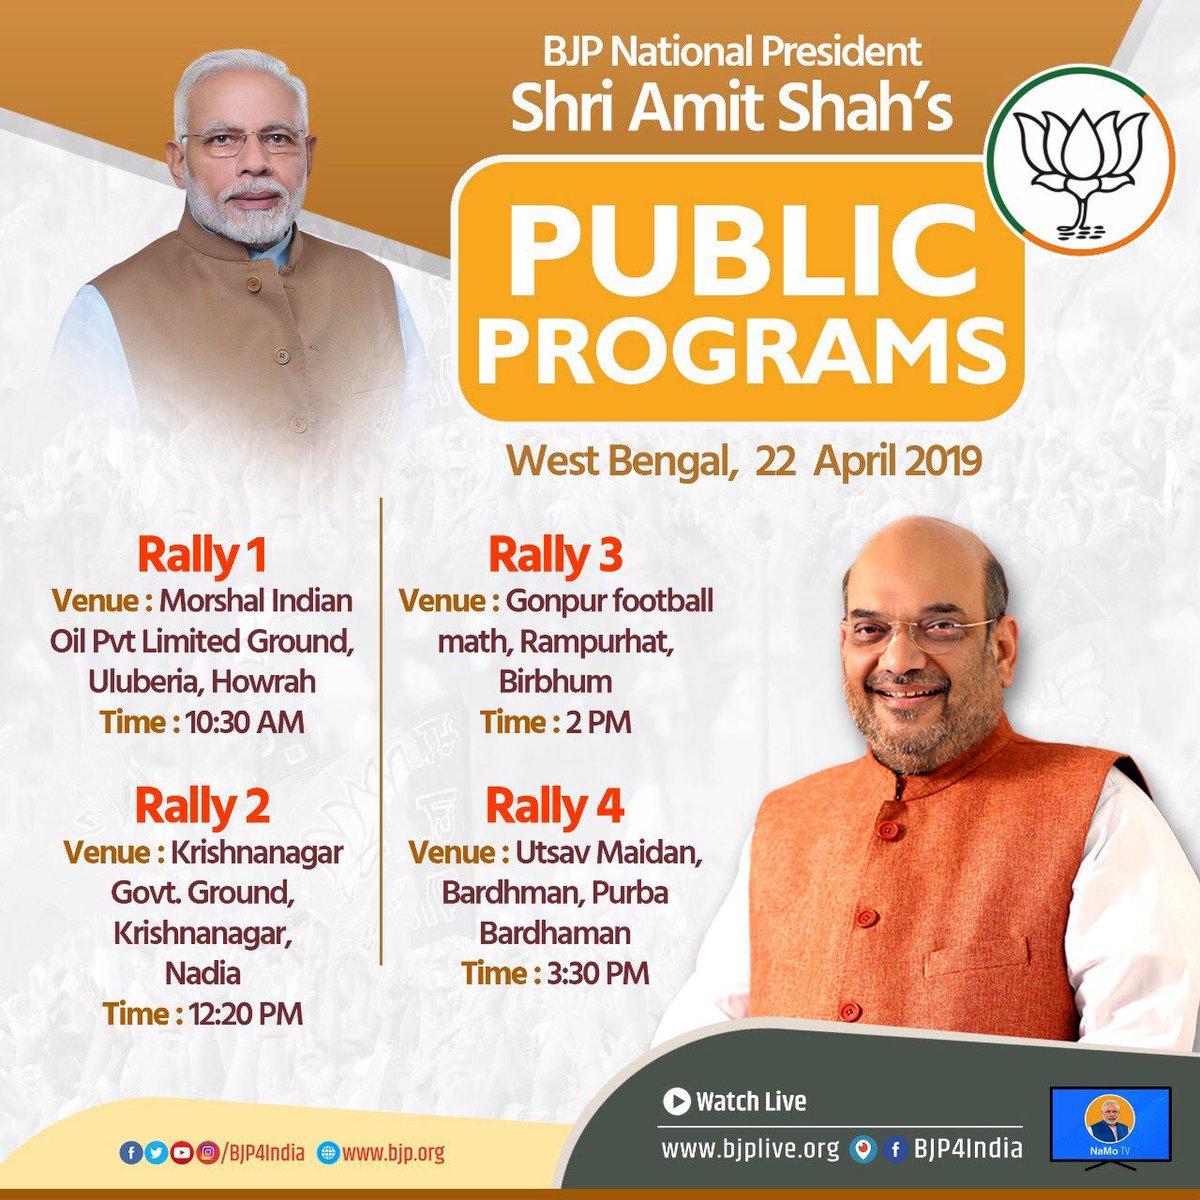 BJP National President Shri @AmitShah ji's  Today's Schedule: